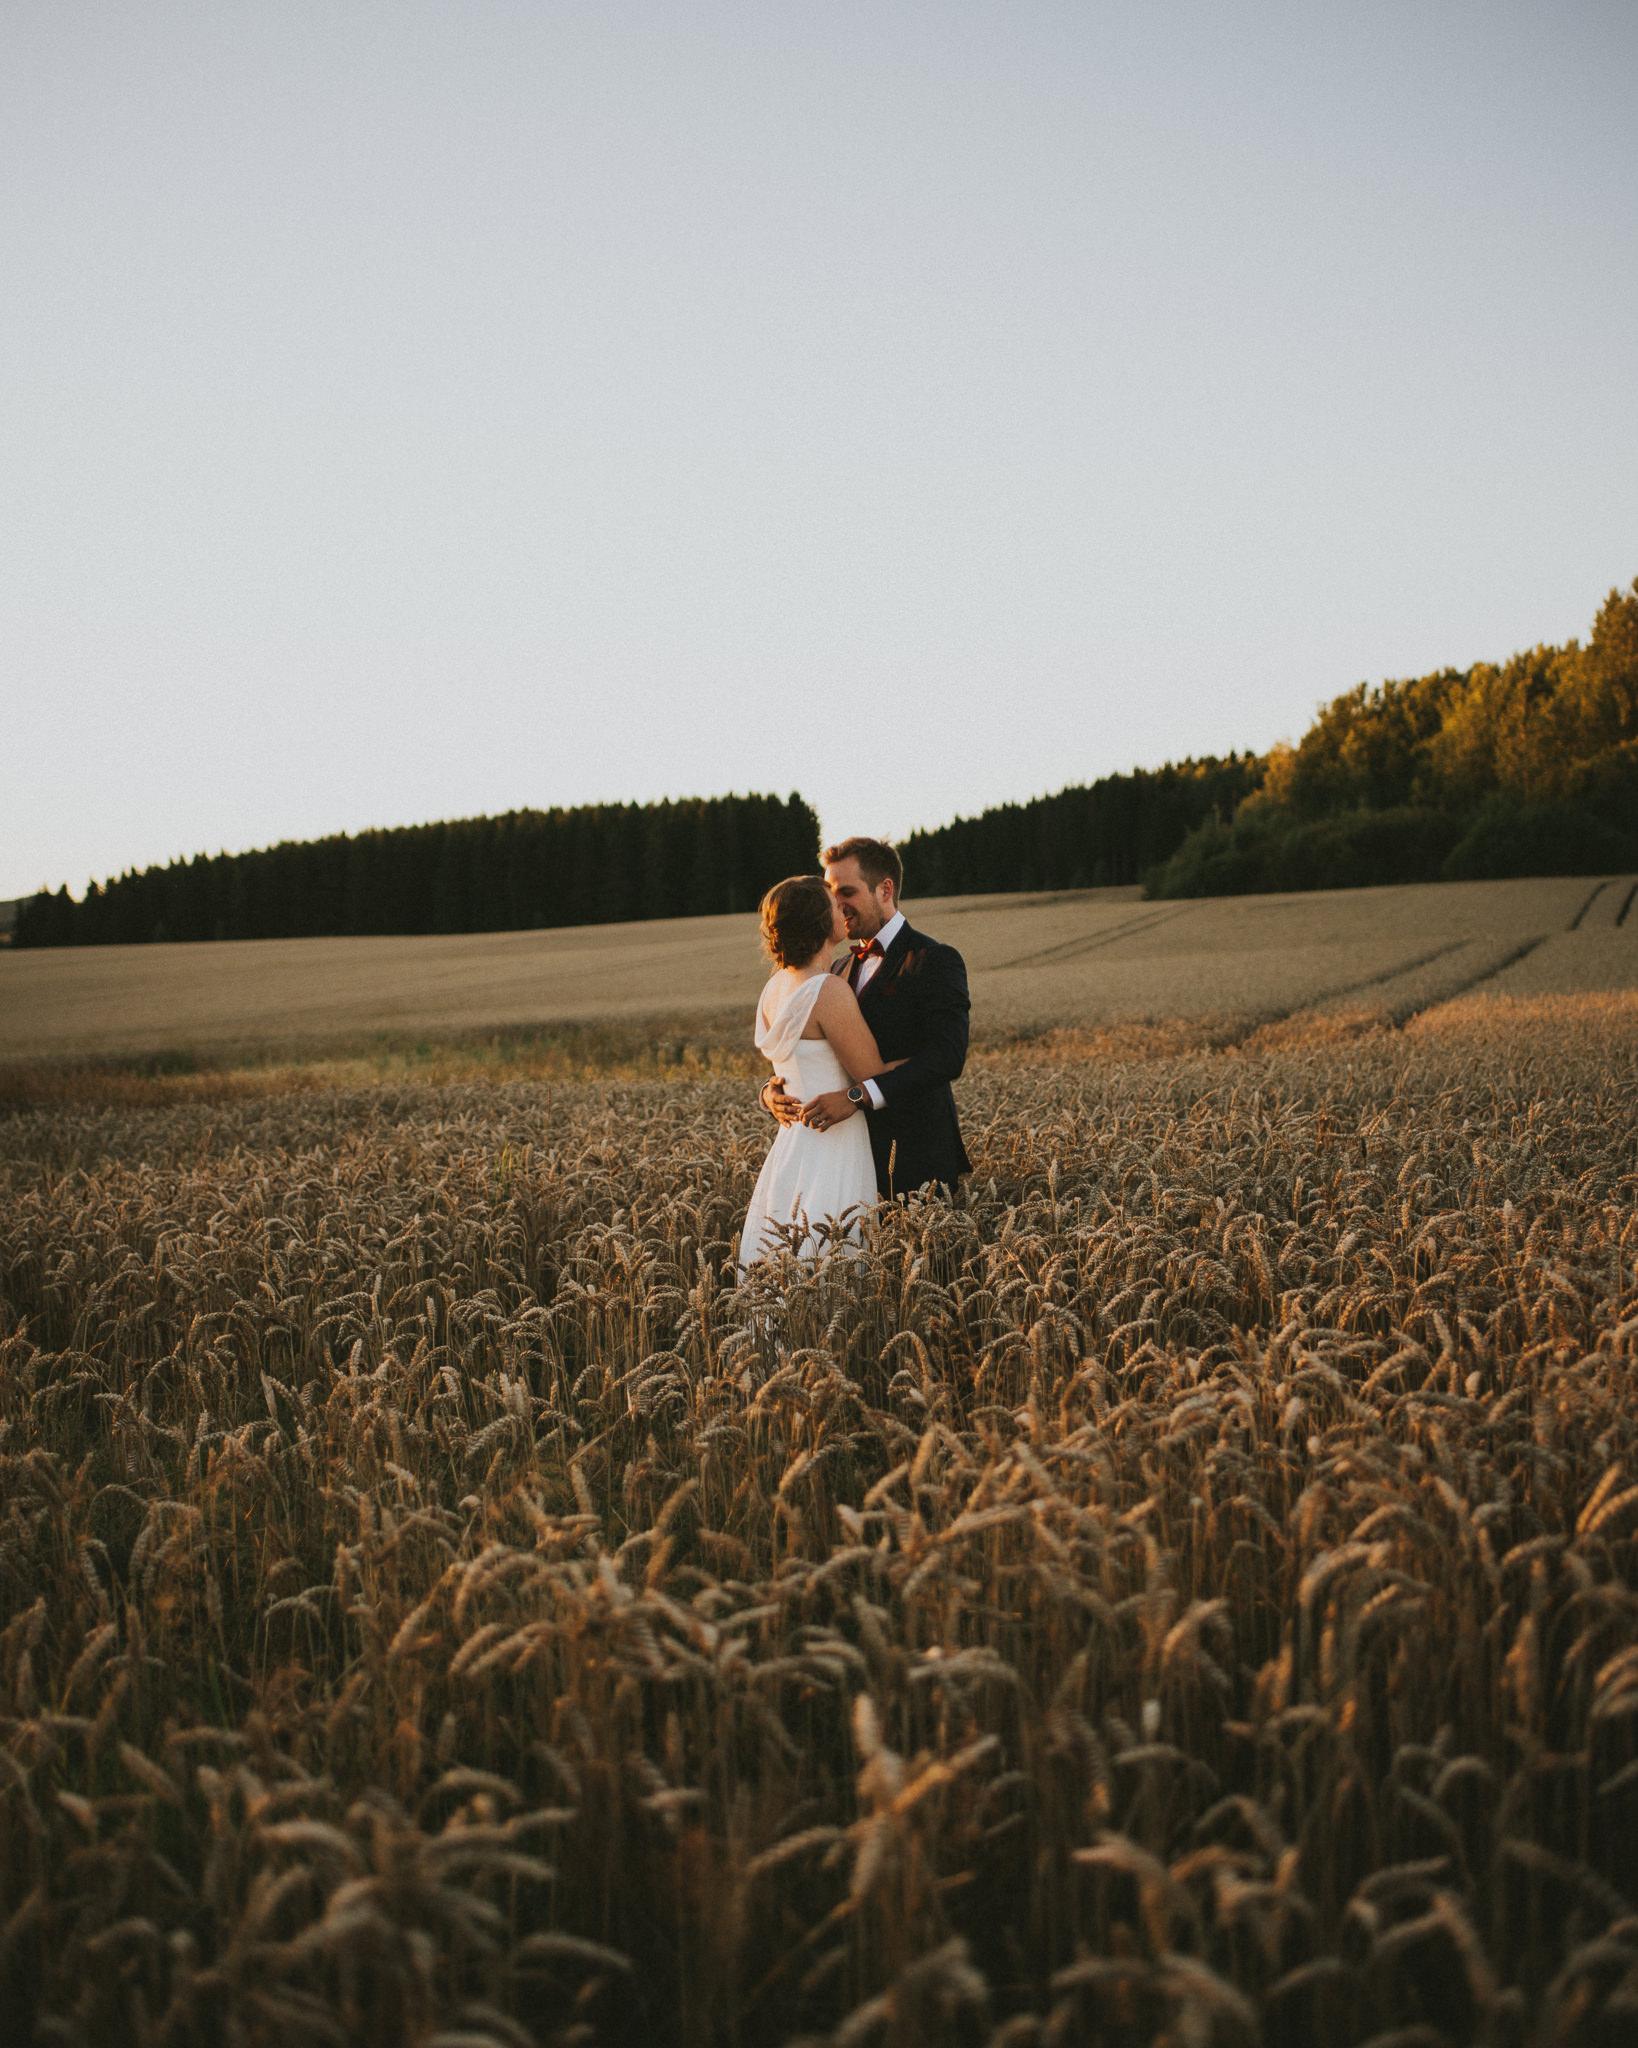 sweden-wedding-martarobin-5245.jpg